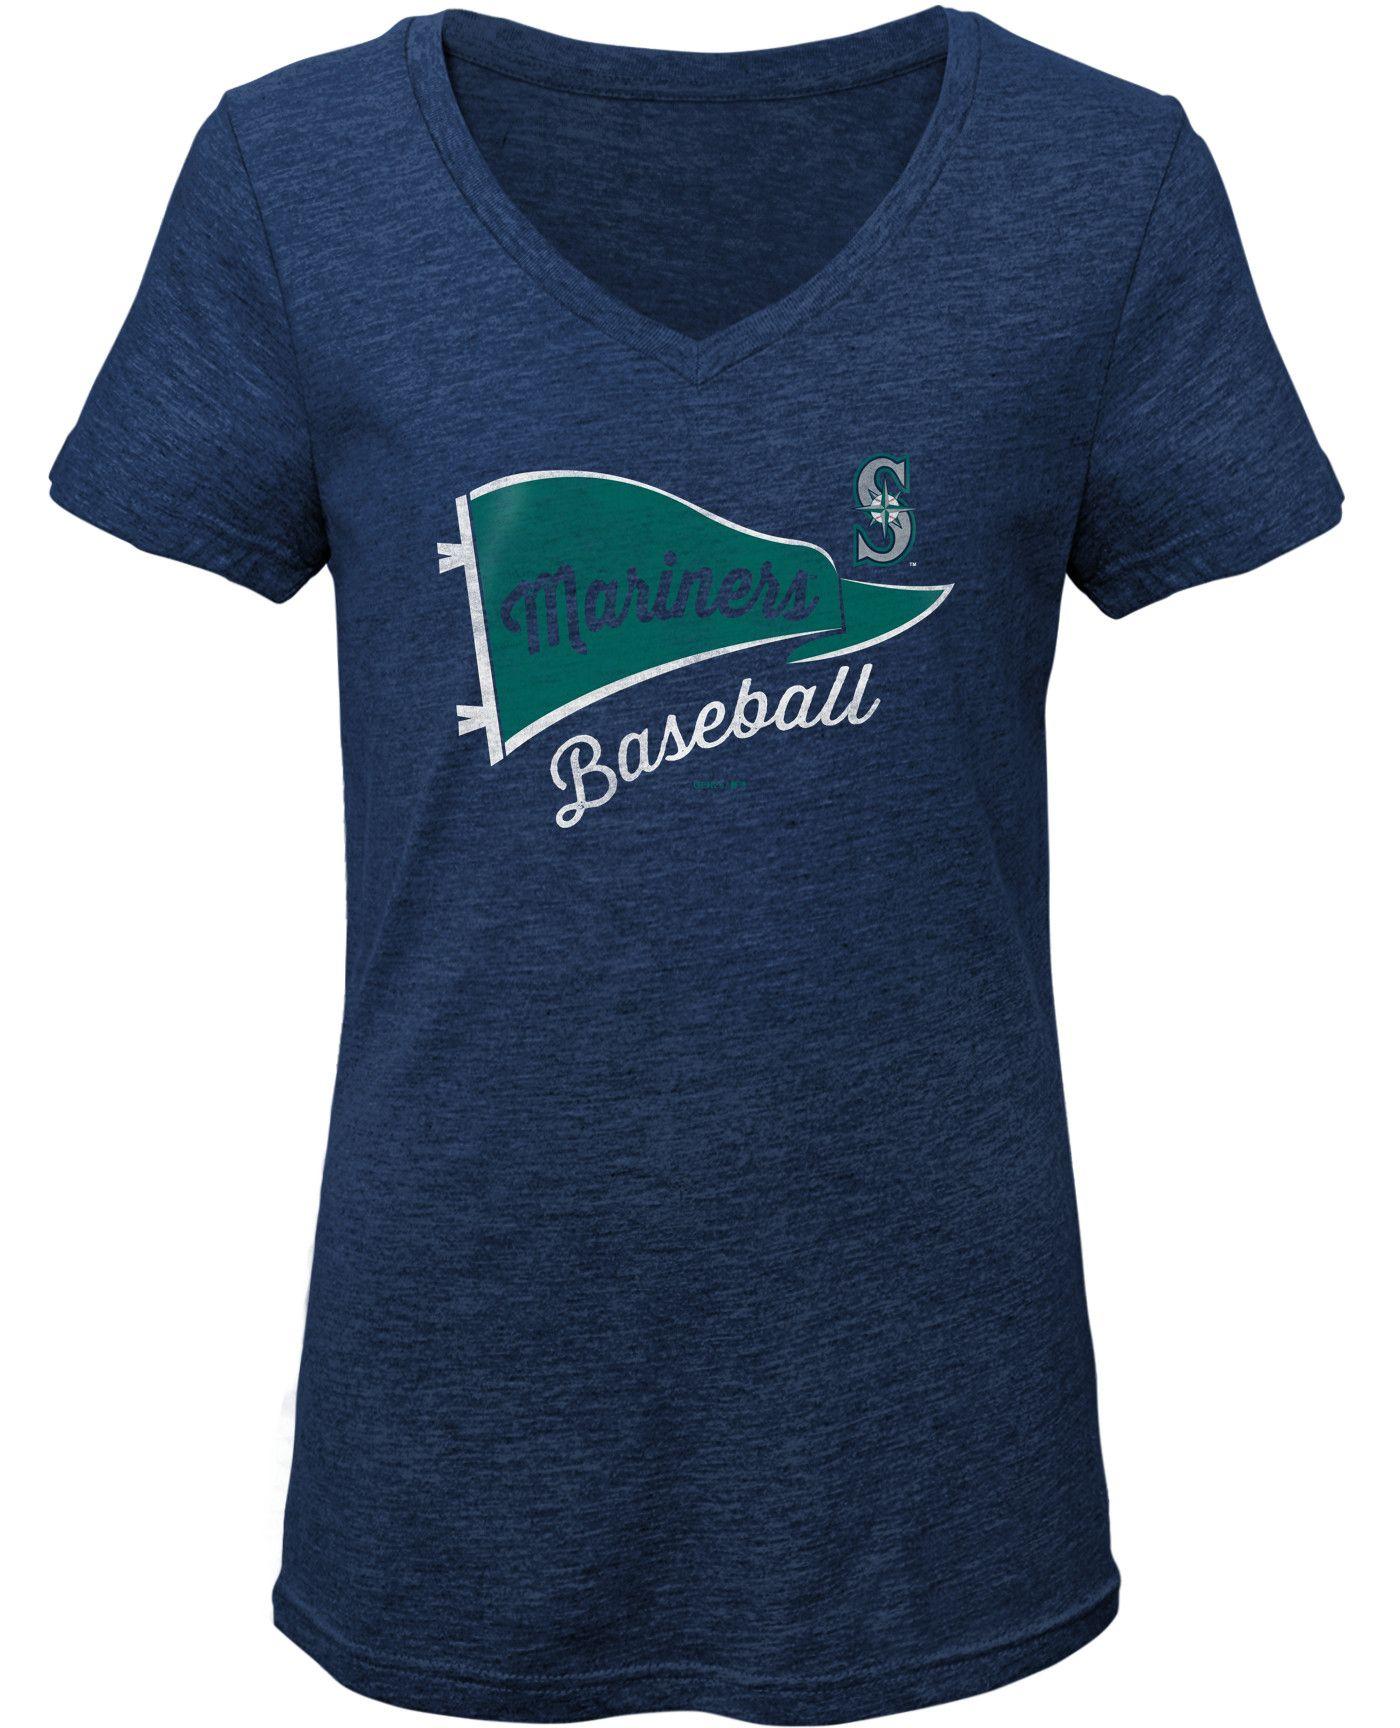 Gen2 Youth Girls' Seattle Mariners Tri-Blend V-Neck T-Shirt